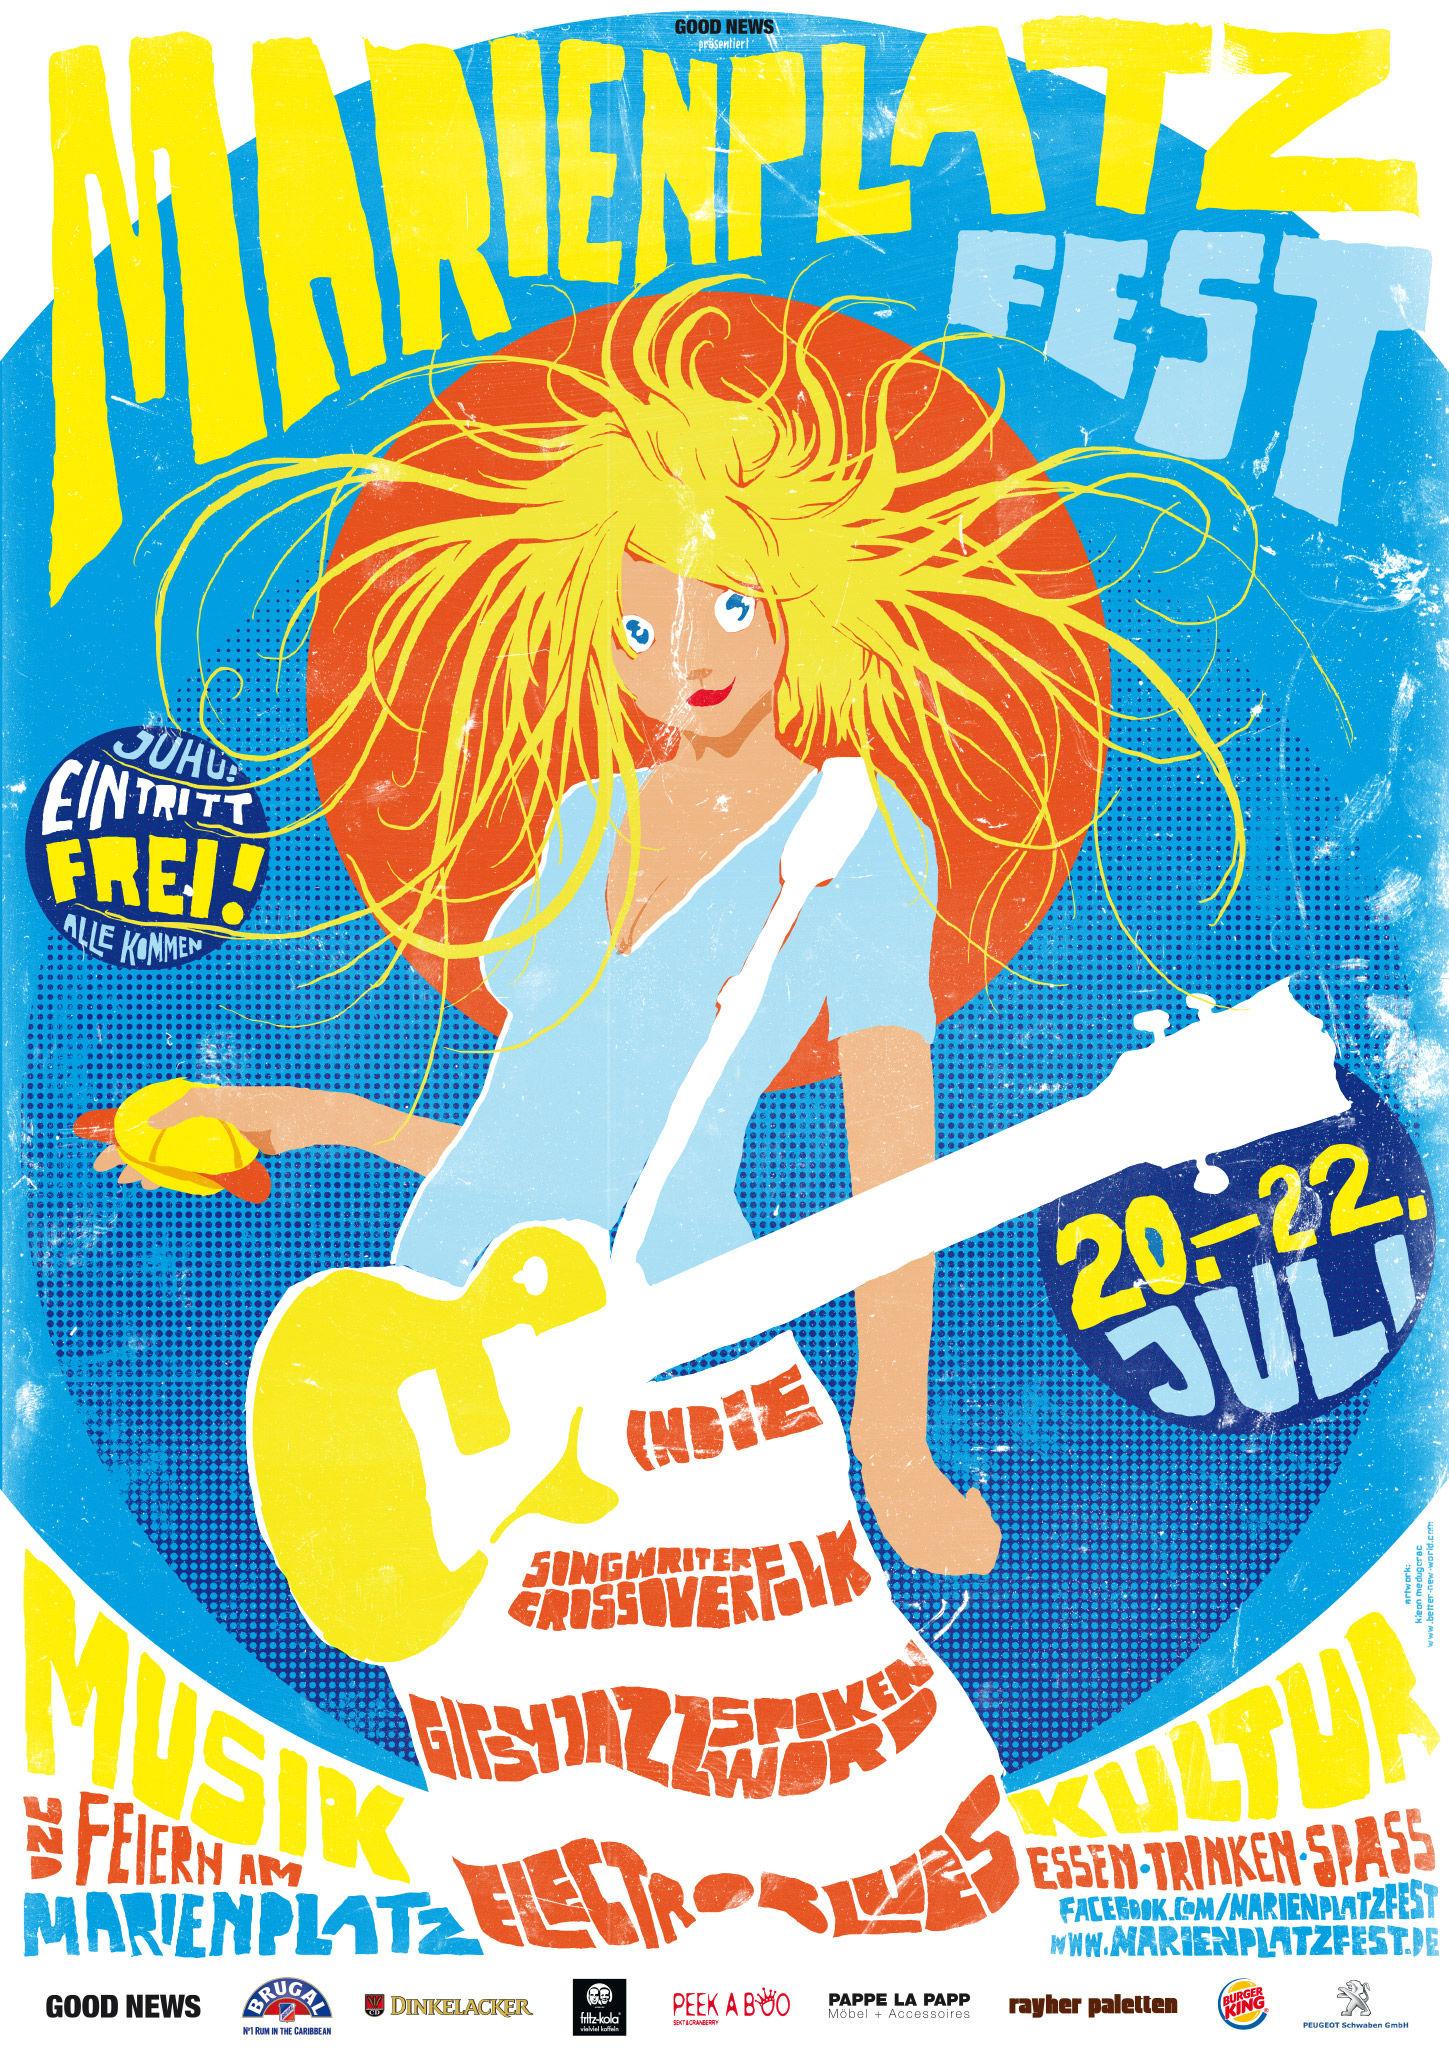 Kleon Medugorac Marienplatz Fest 2012